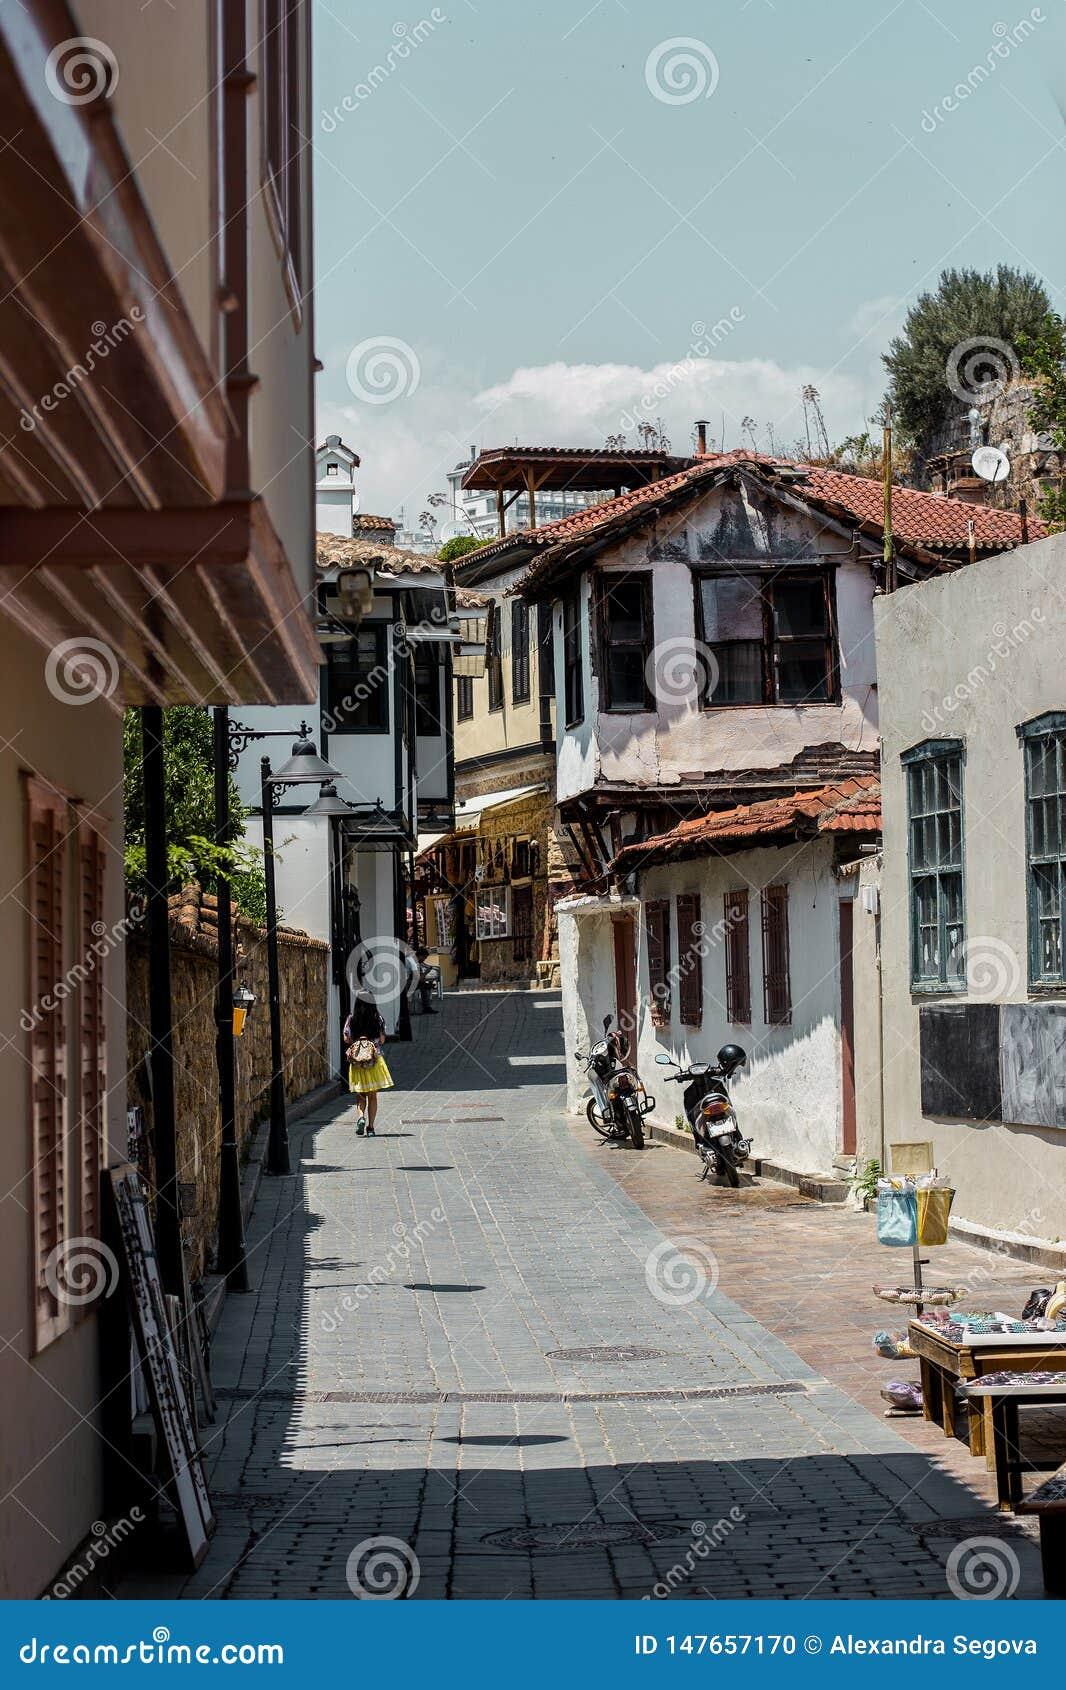 Girl walking down the sunny street of old town Kaleici, Antalya, Turkey